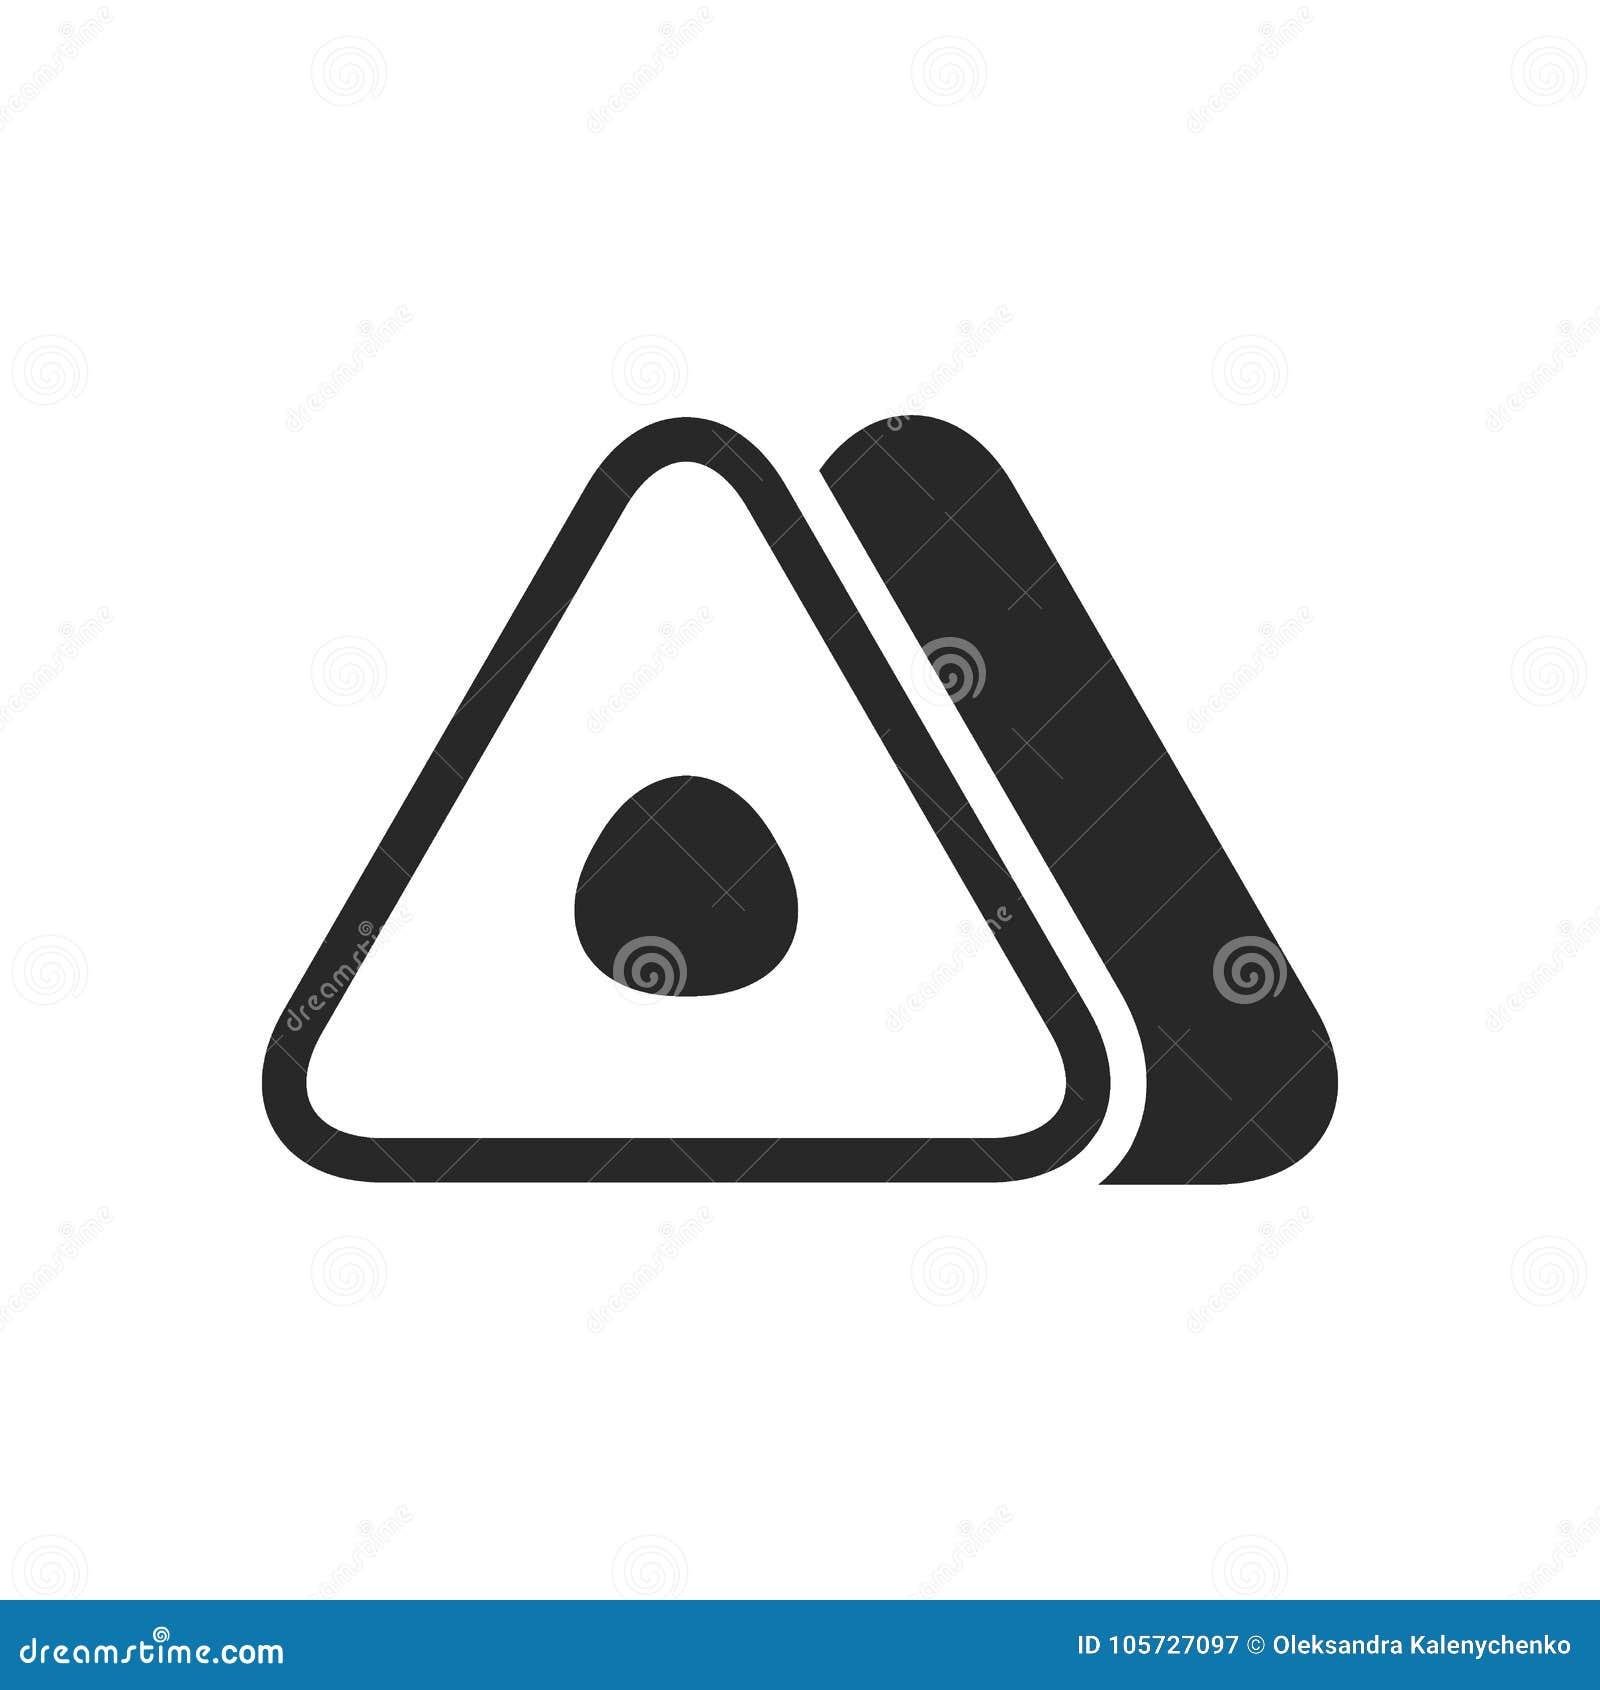 Monochrome japanese triangular roll onigiri icon on white background